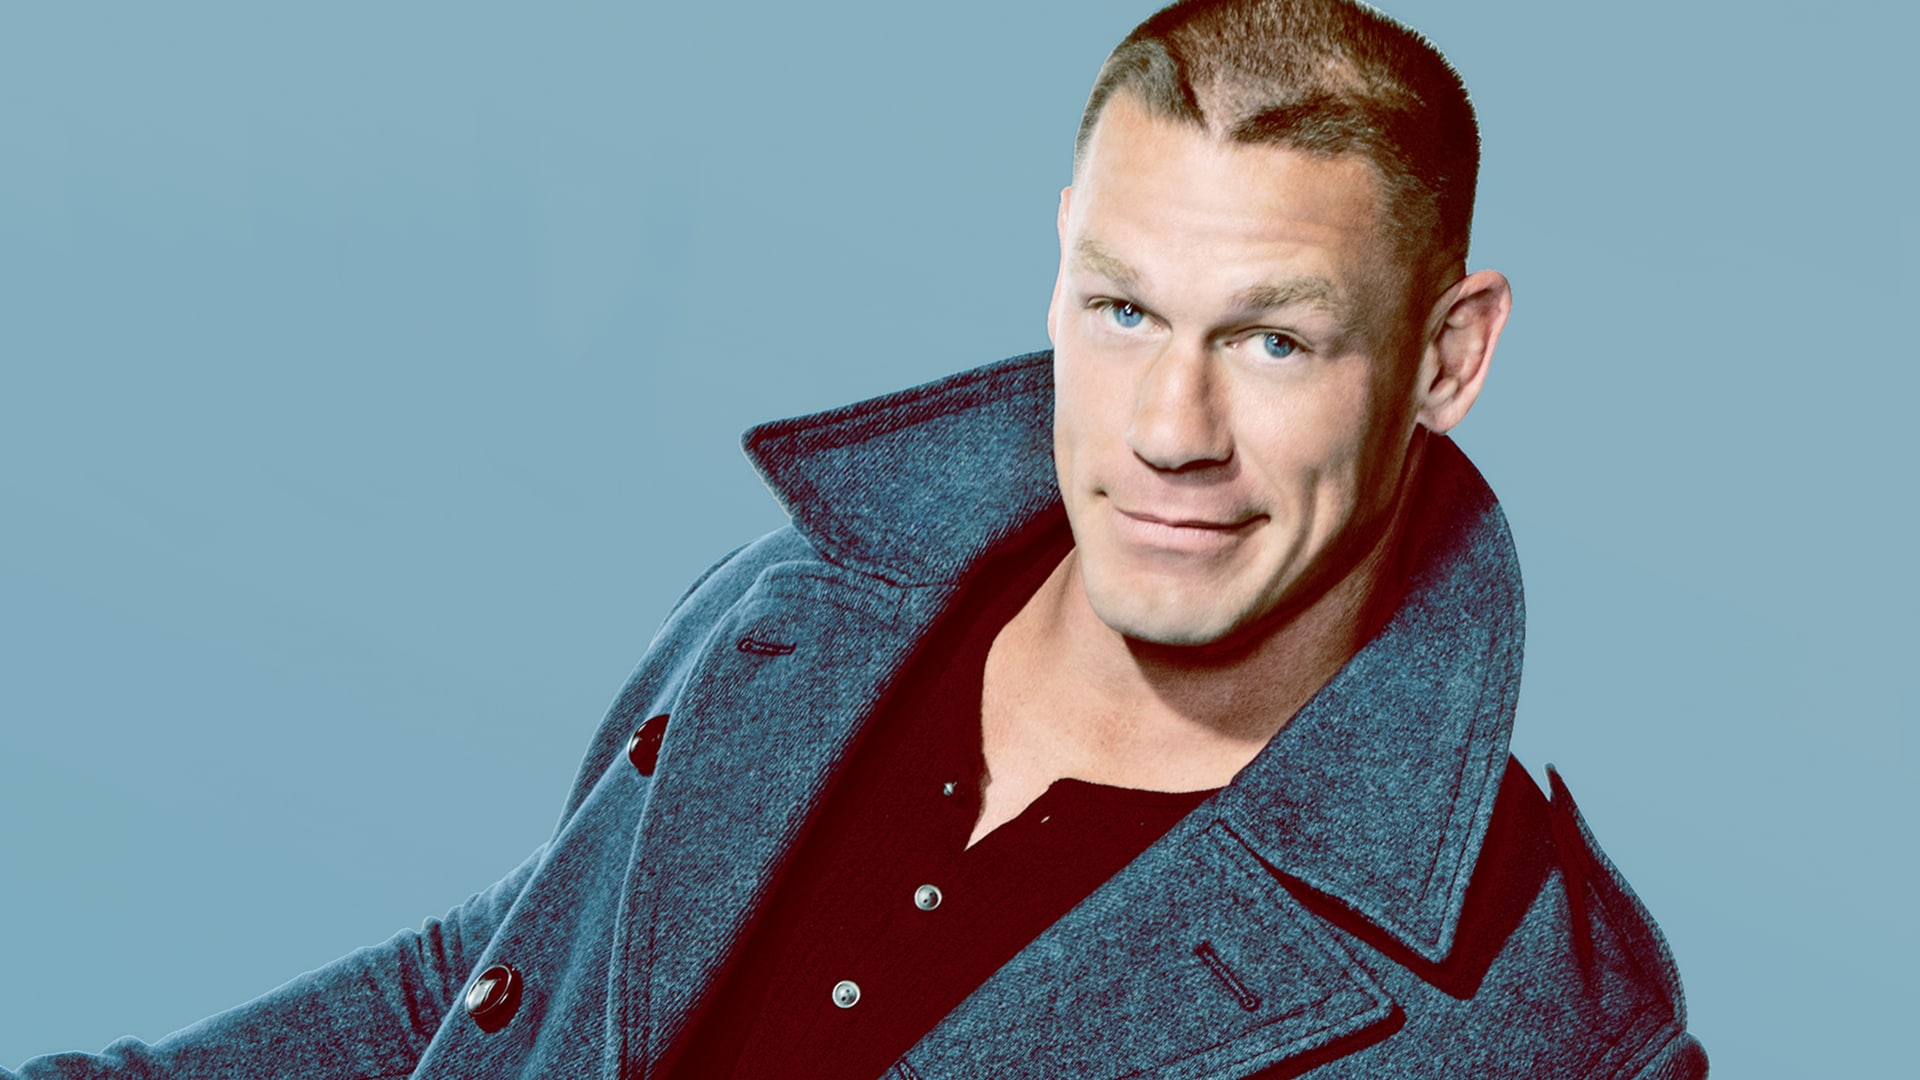 John Cena: December 10, 2016